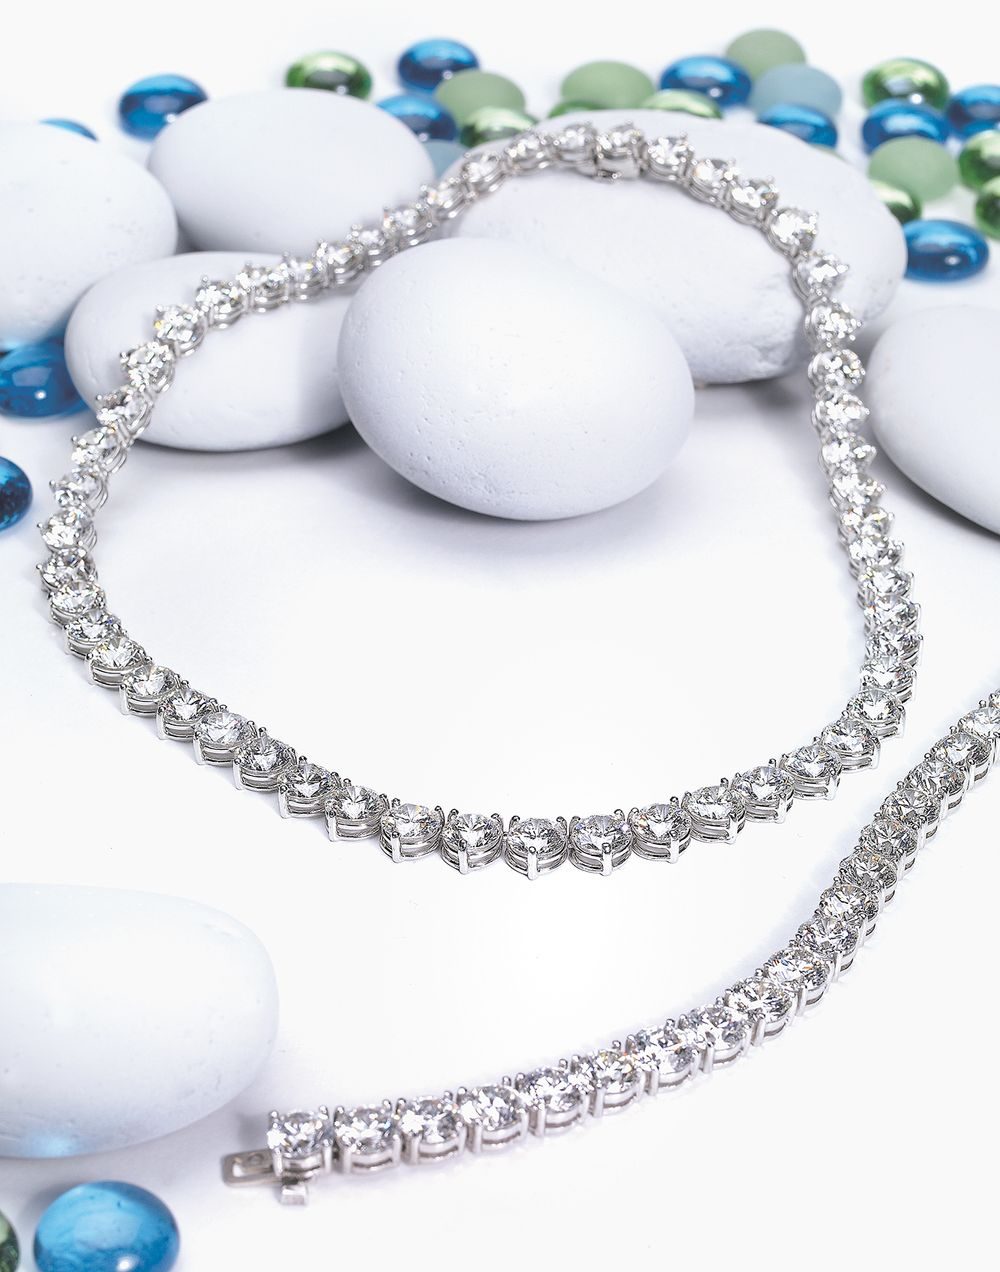 canzi_necklace_braclet.jpg